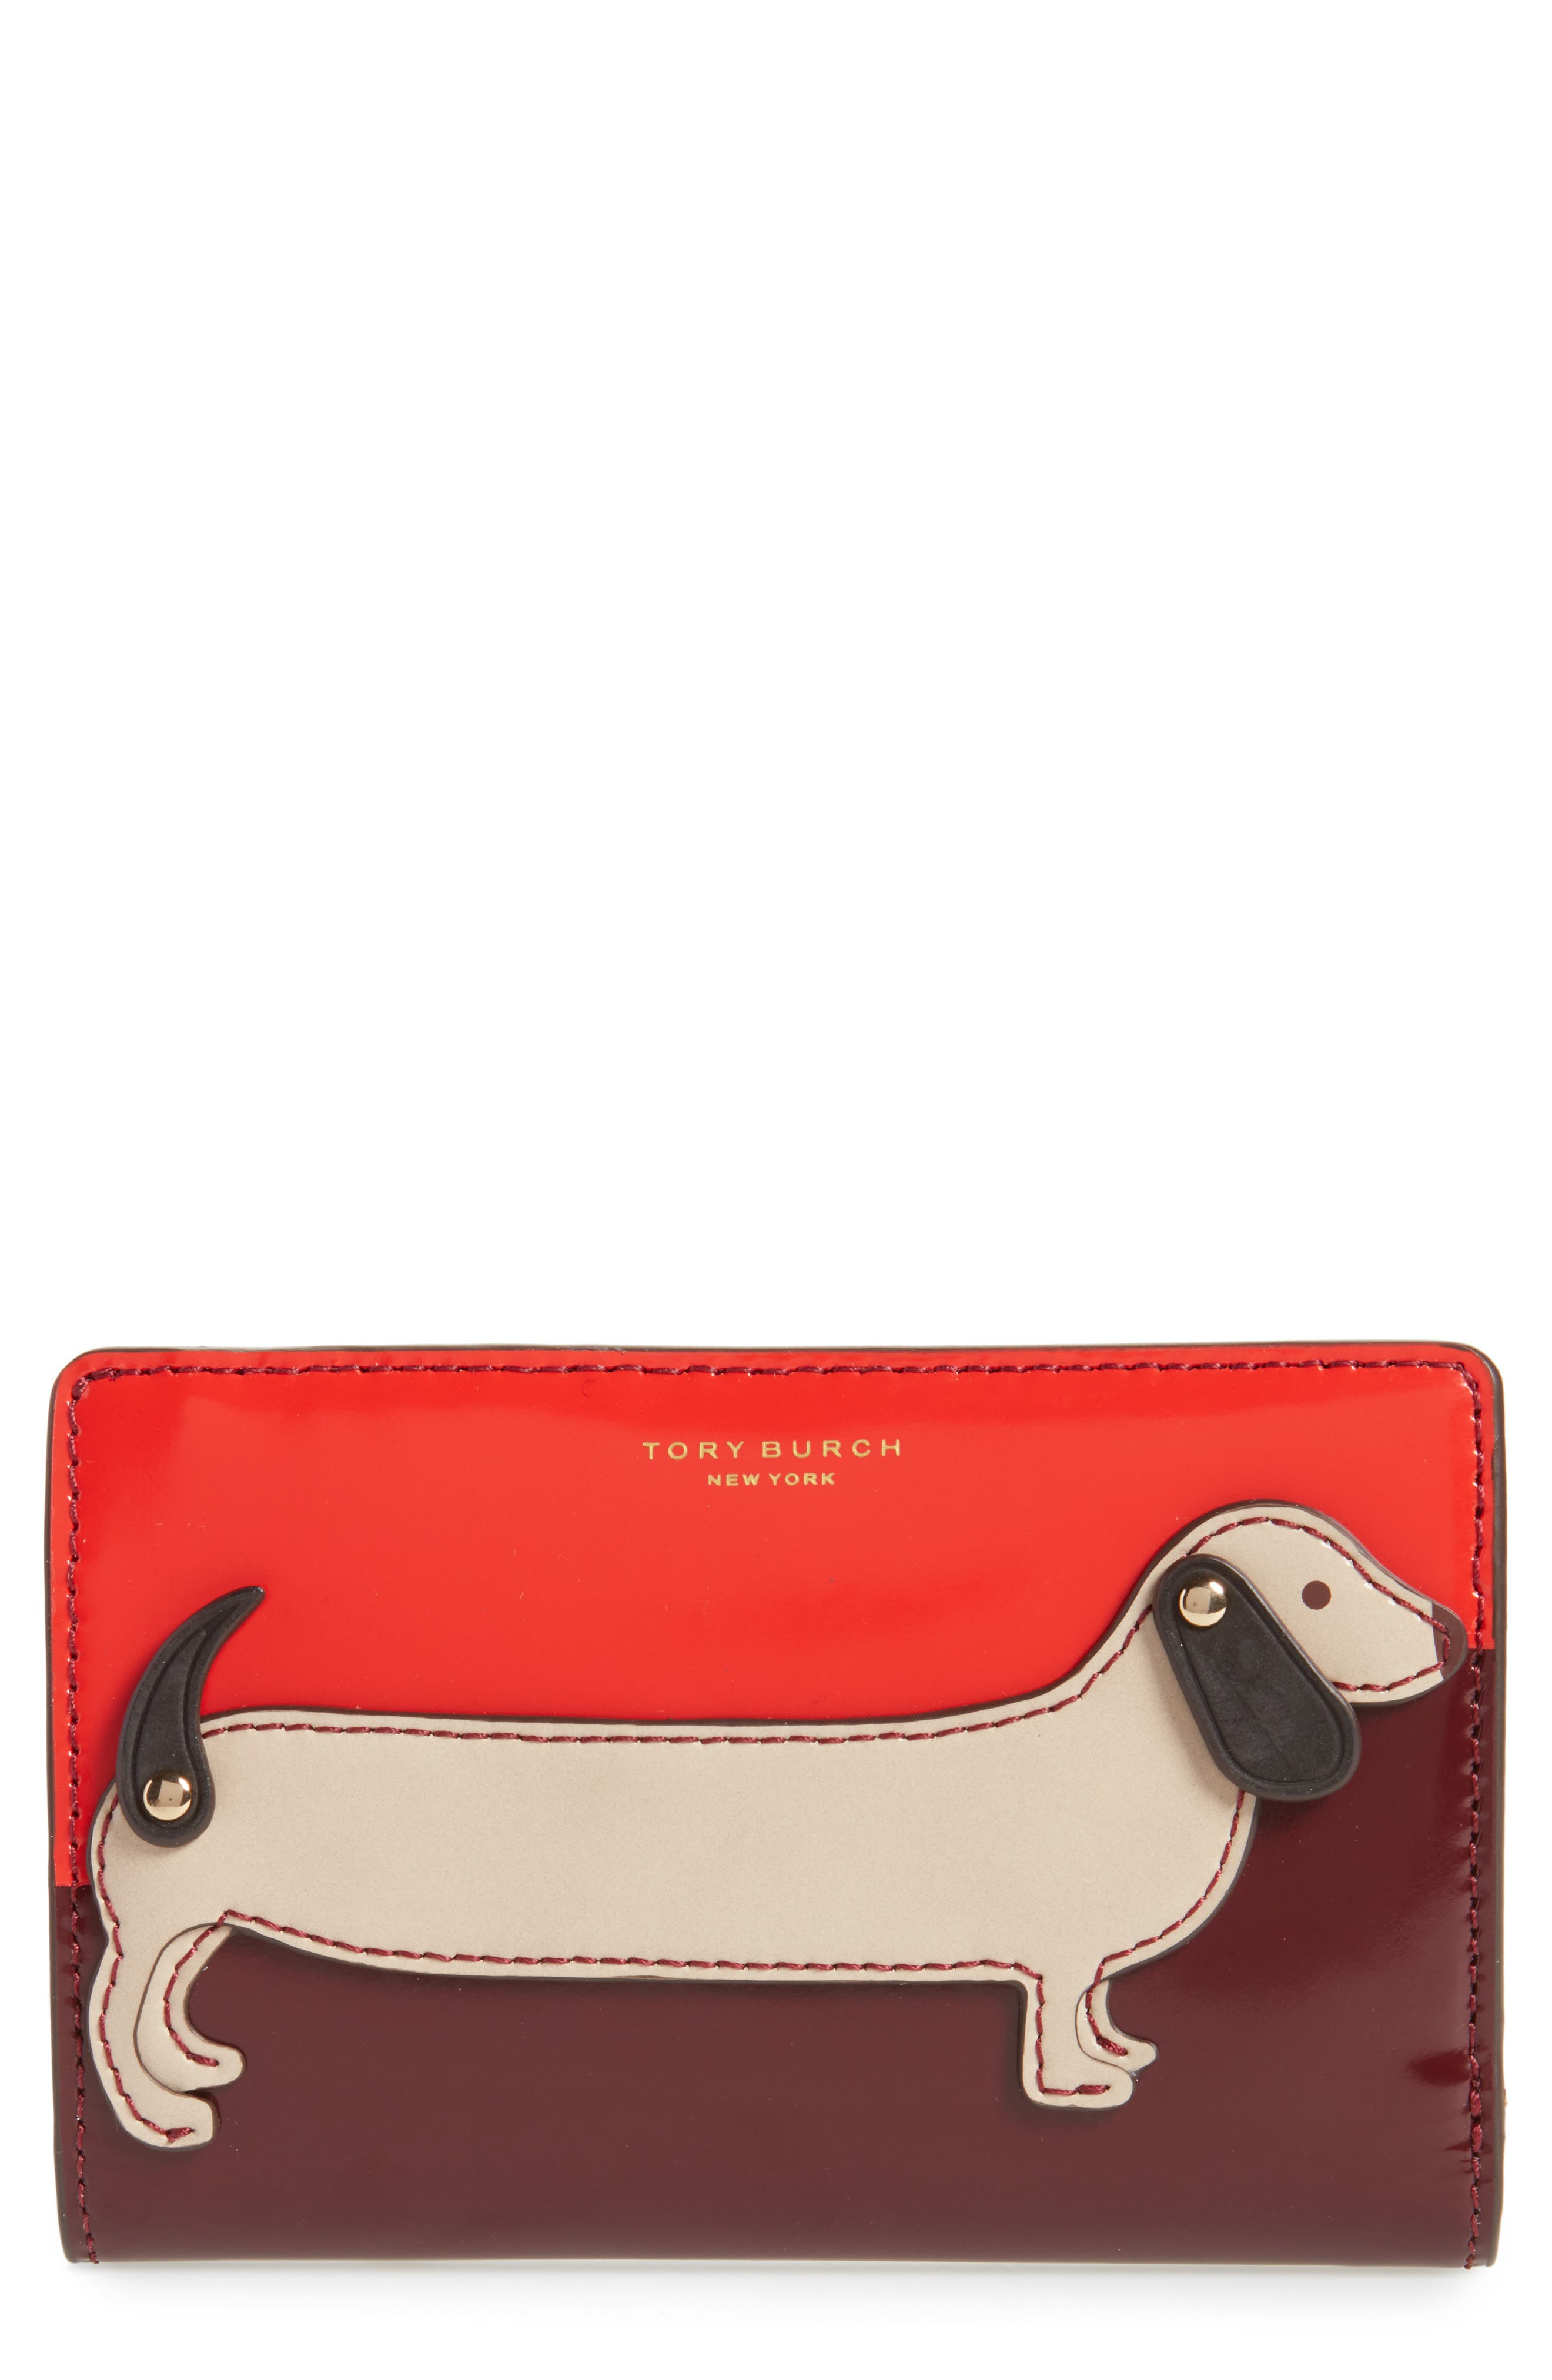 Alternate Image 1 Selected - Tory Burch Medium McGraw Dachshund Slim Leather Wallet